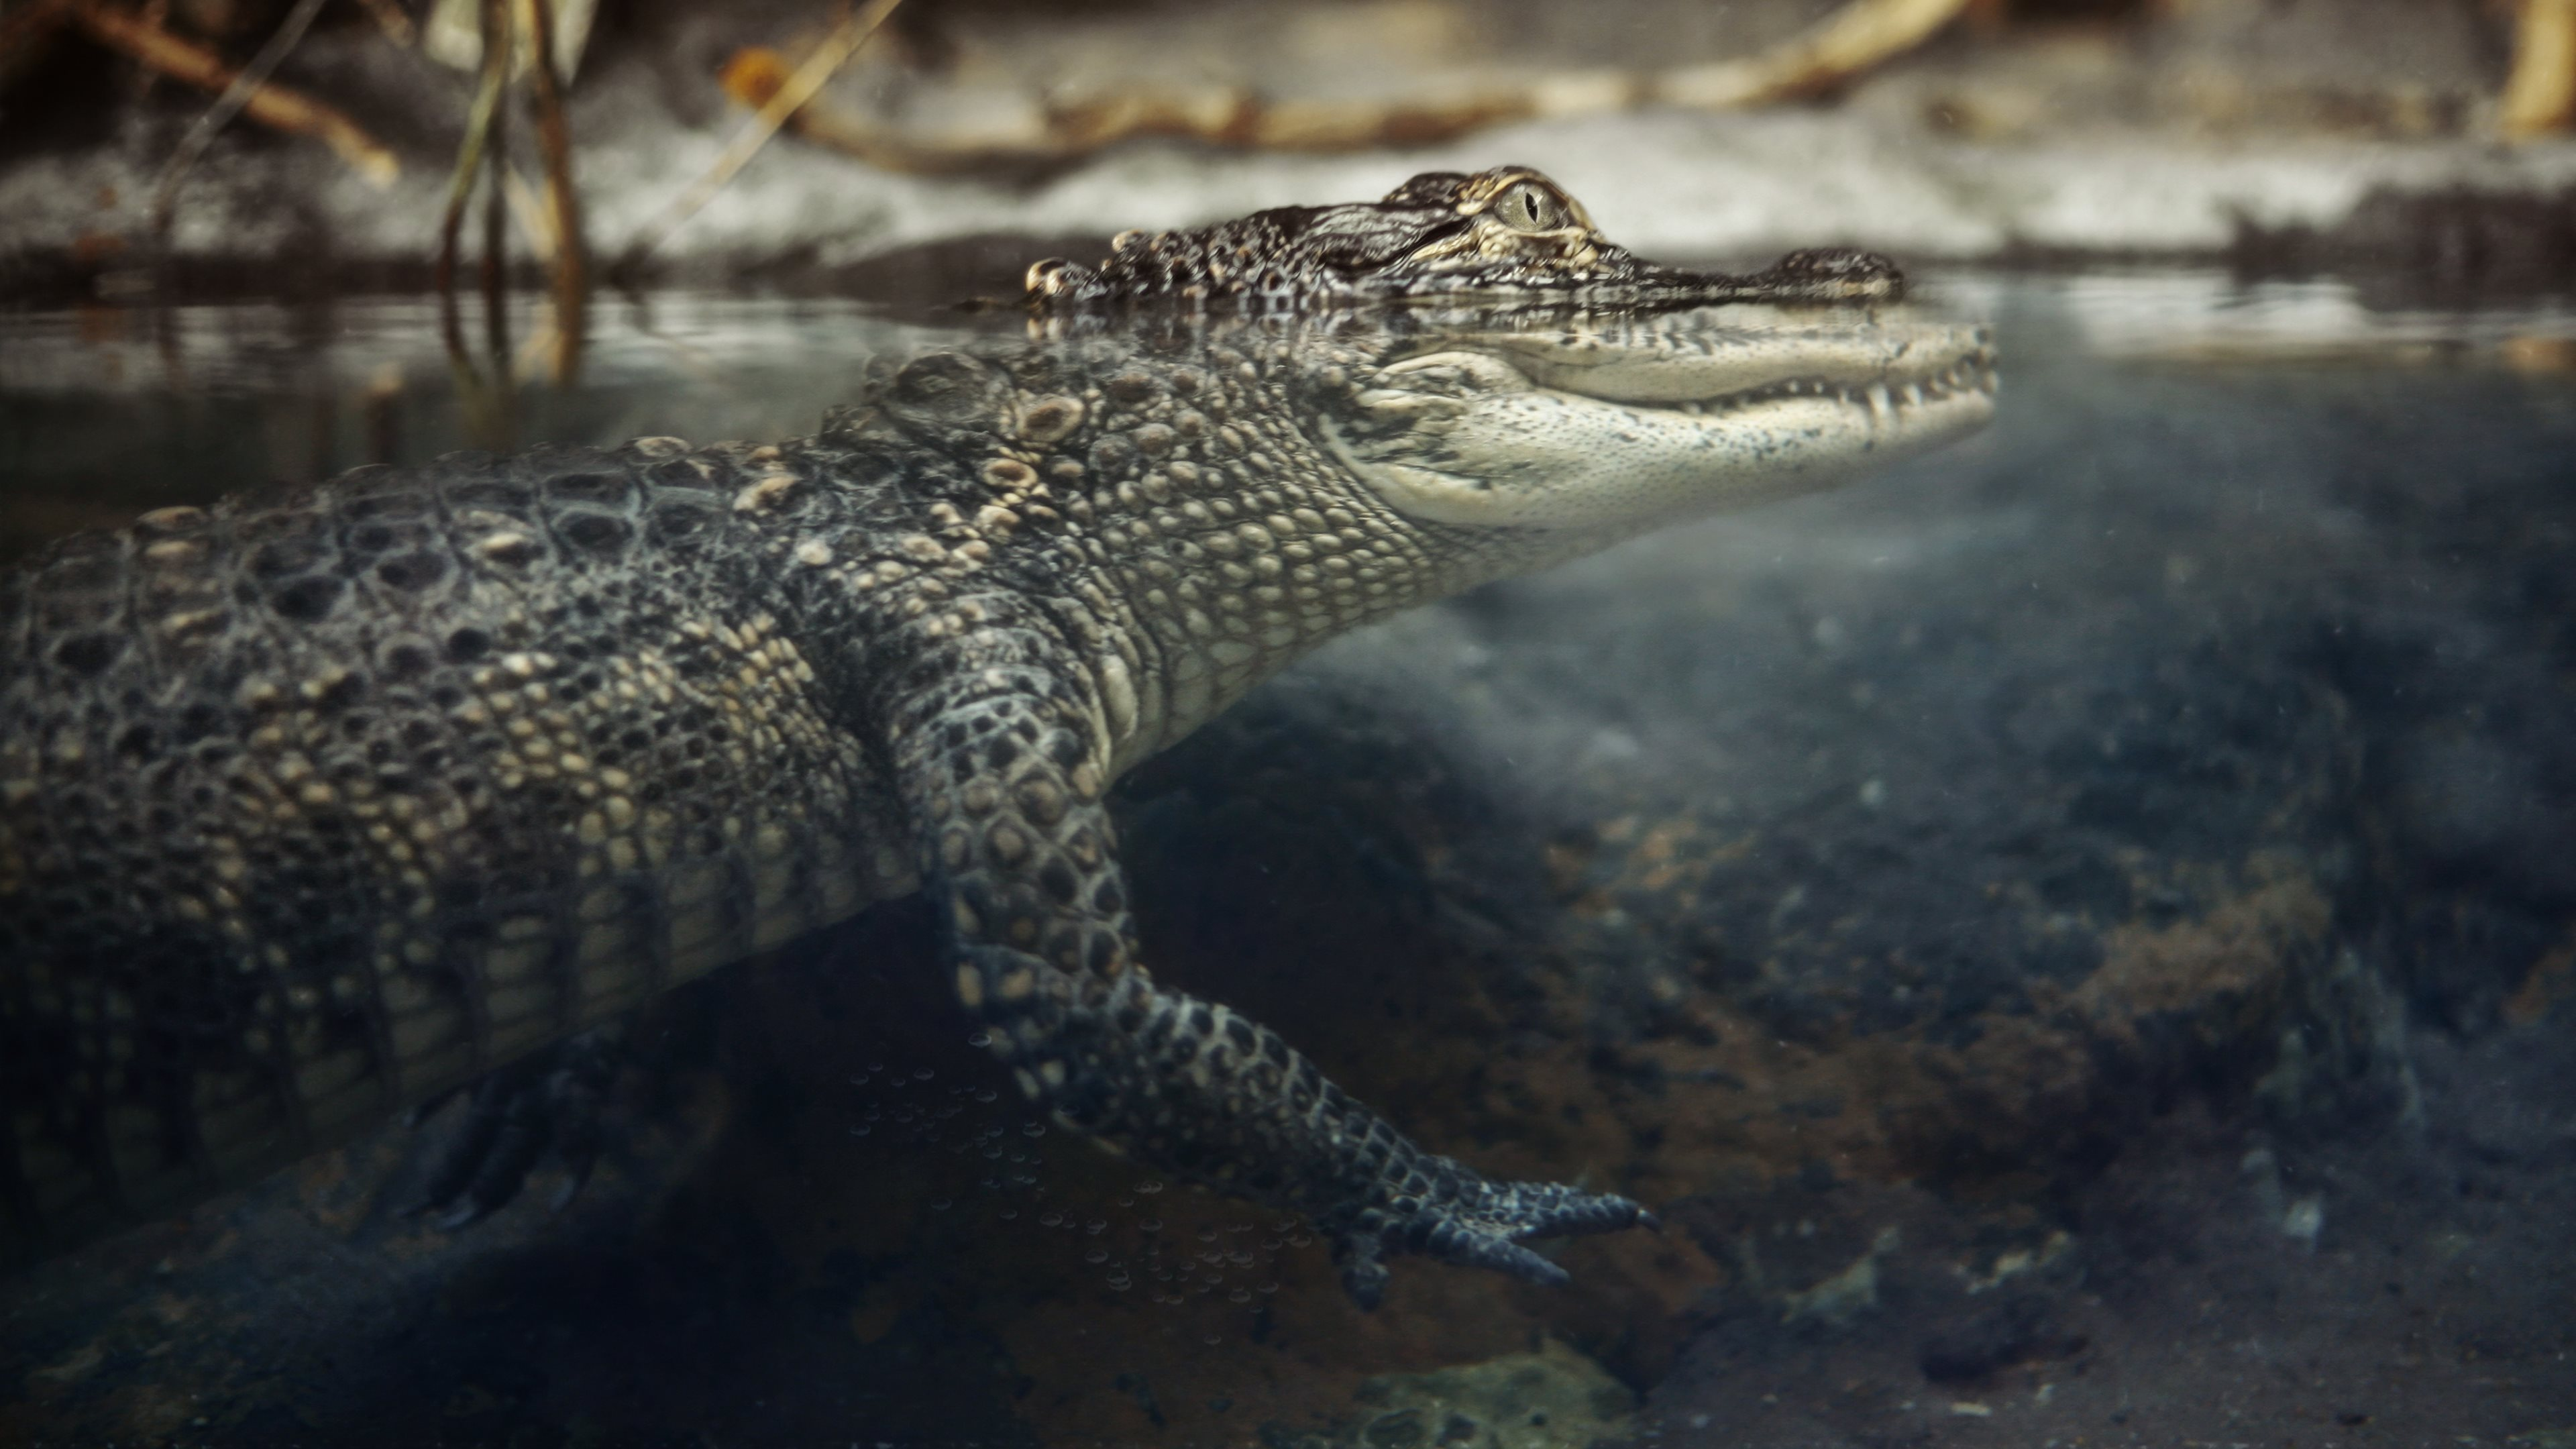 Alligator Computer Wallpaper